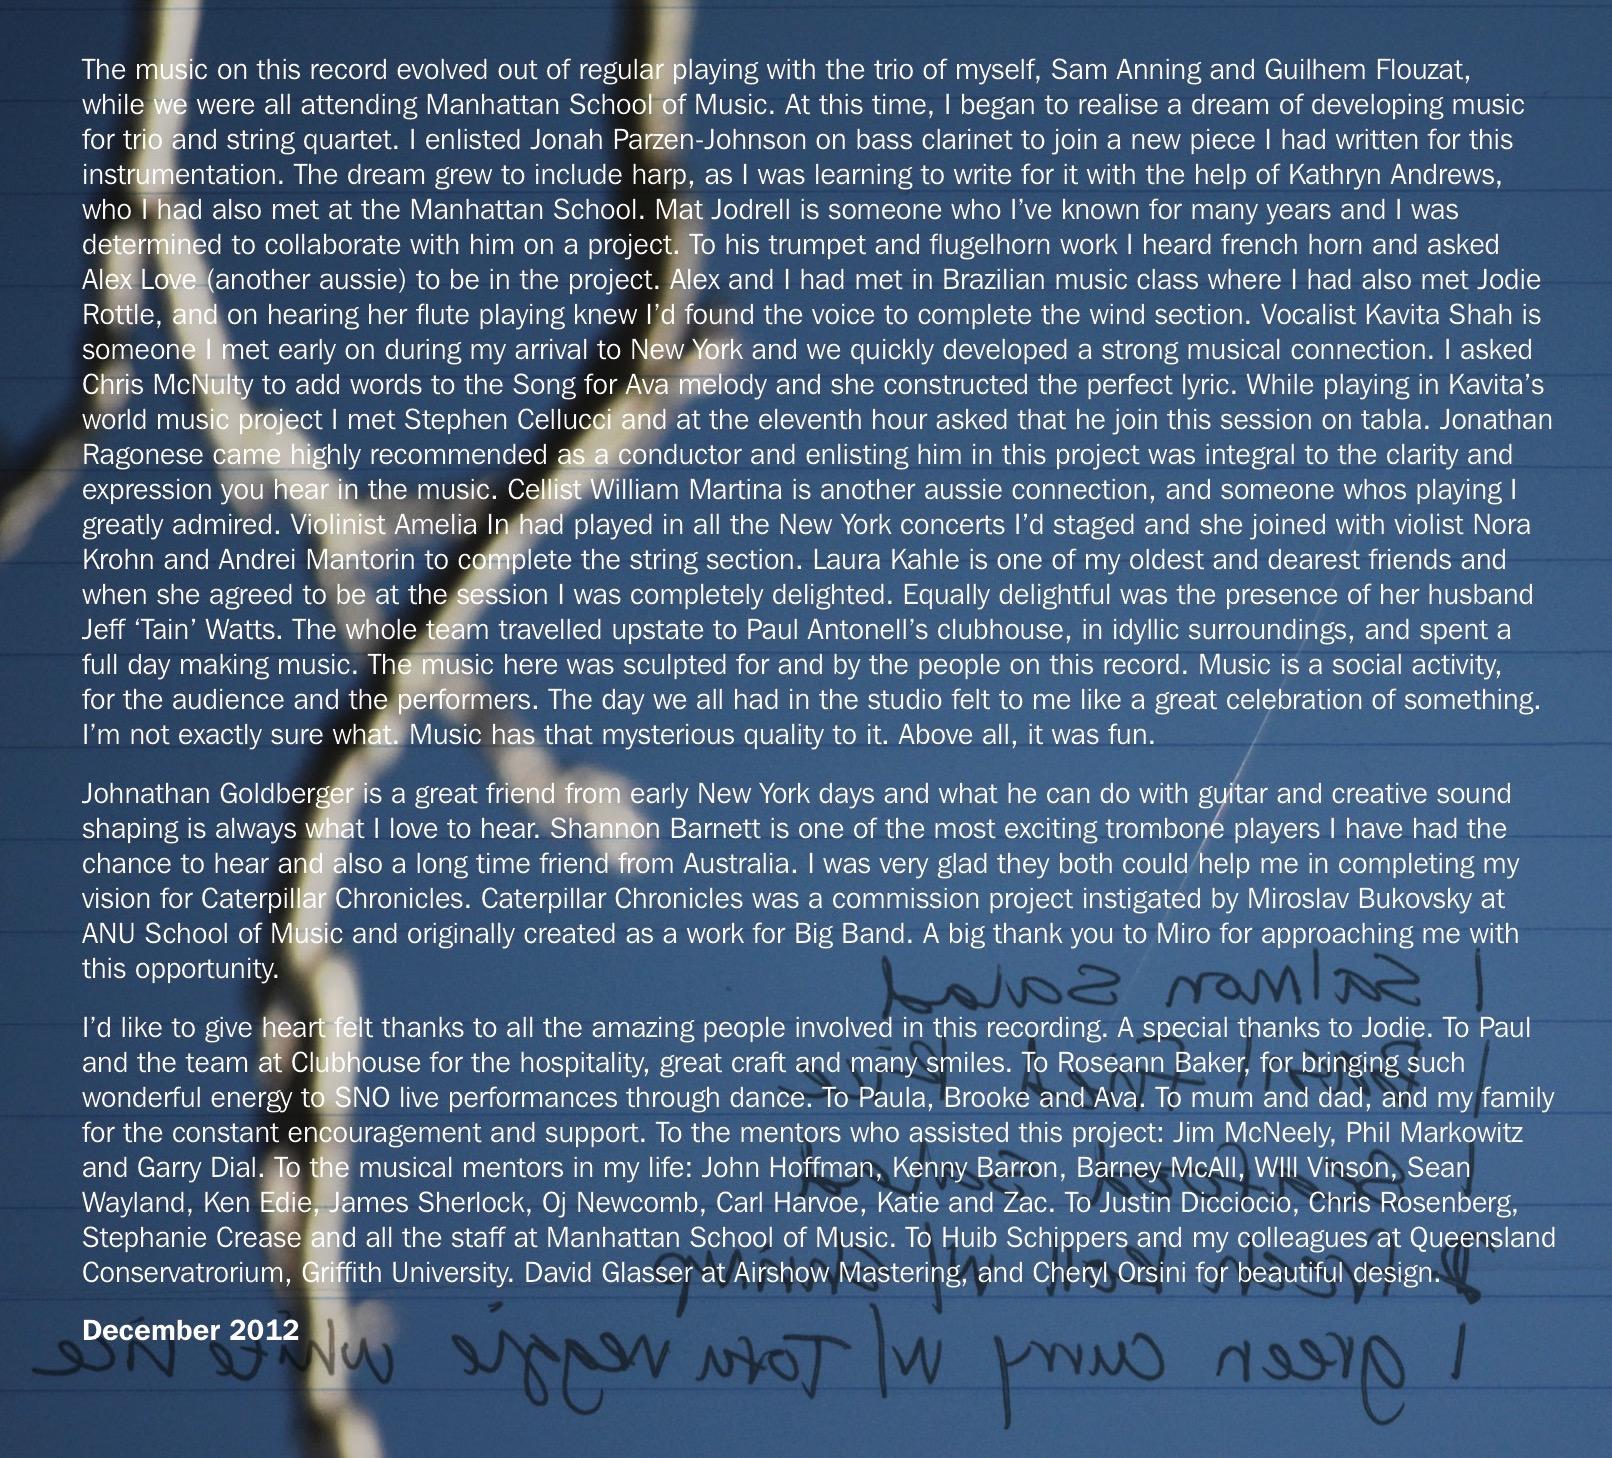 Song of Ava_album_sleeve 5.jpeg